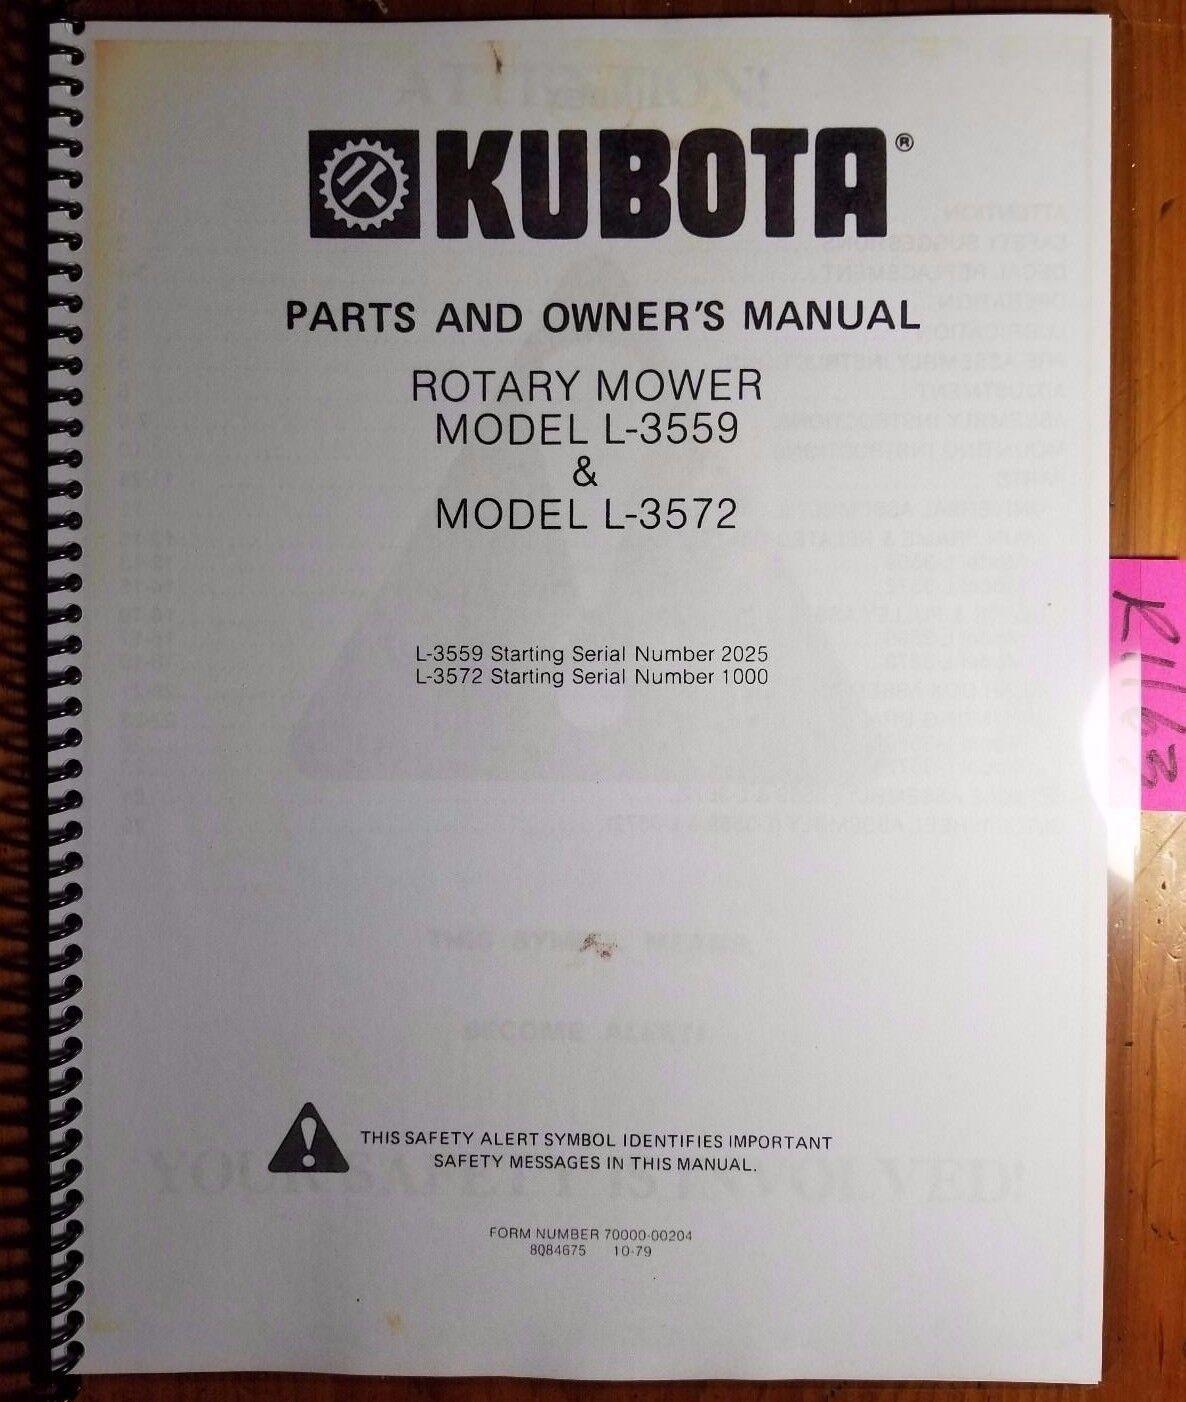 Astonishing Kubota L2500 Wiring Diagram Gallery Wiring schematic – Kubota M9000 Wiring Diagram